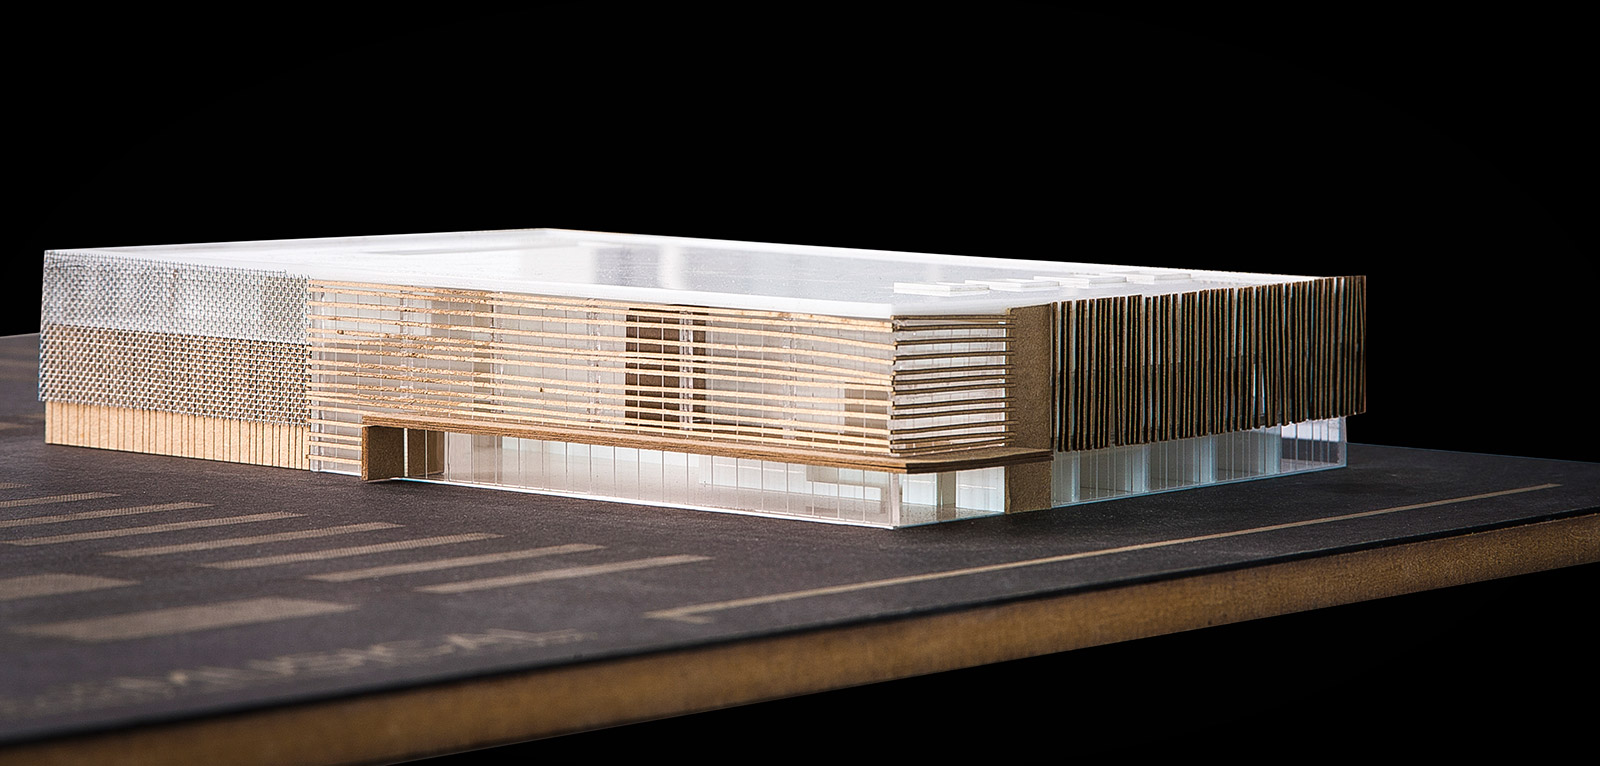 maqueta-arquitectura-architecture-model-tfg-etsav-upv-centro-de-produccion-musical-arquimaqueta-valencia-7